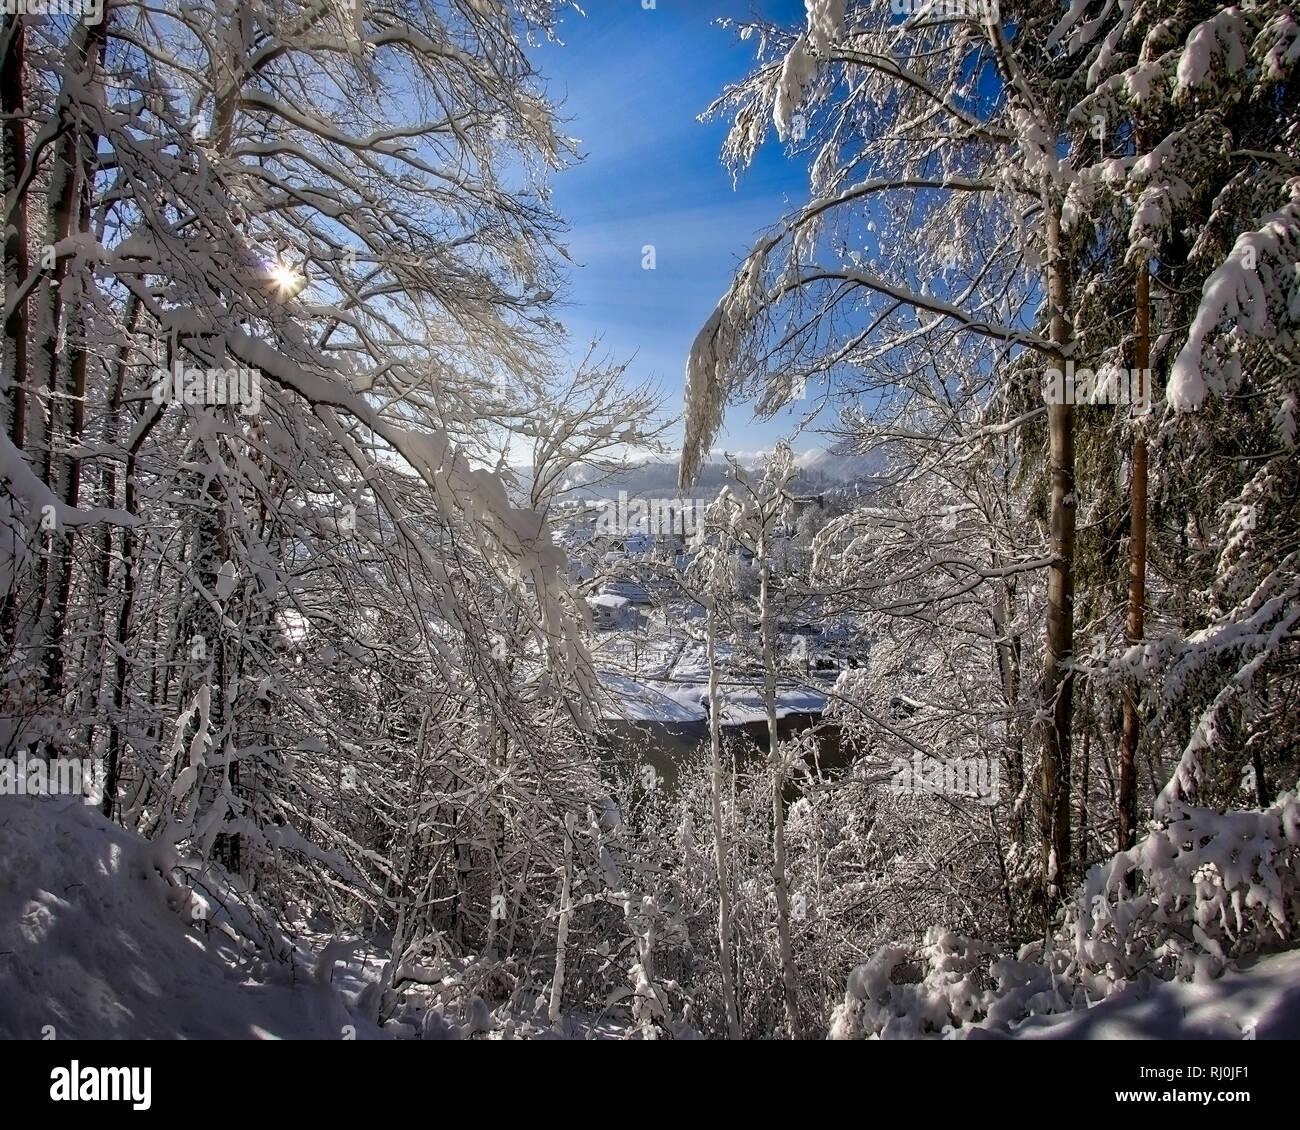 DE - BAVARIA: Wintry woodlands along river Isar at Bad Toelz  (HDR-Image) Stock Photo